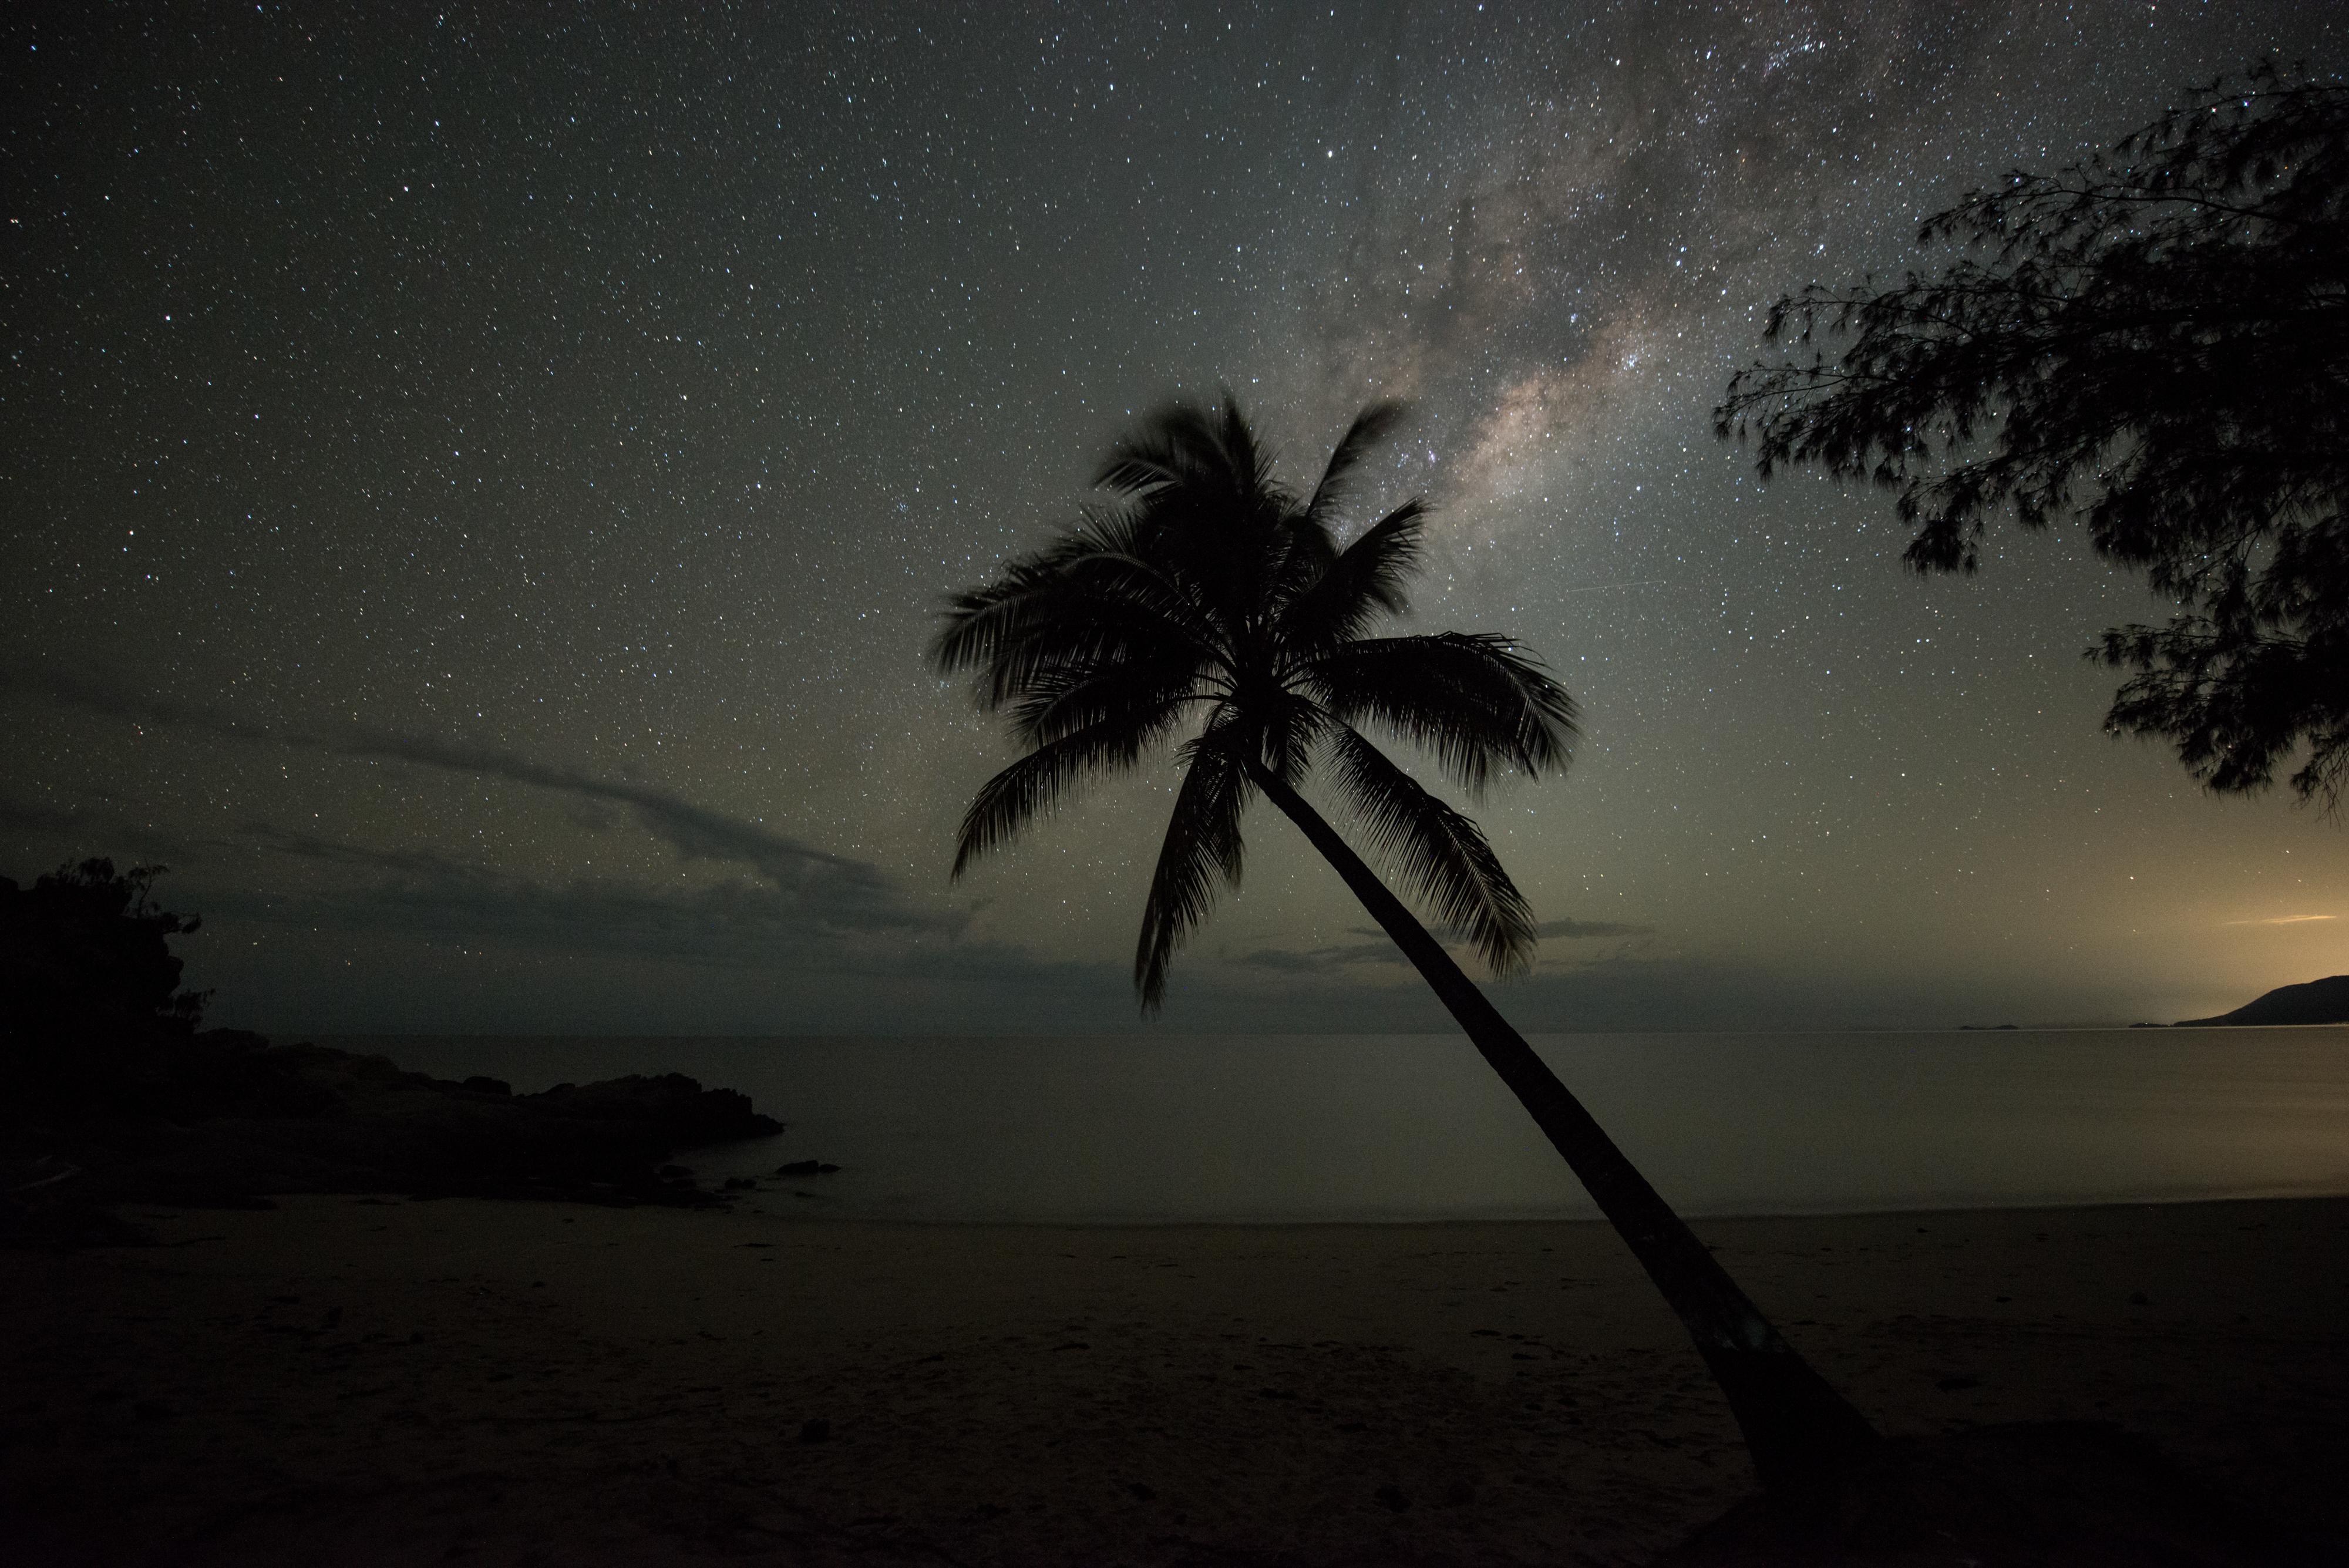 https://www.thalabeach.com.au/wp-content/uploads/2010/07/Thala_Beach_Nature_Reserve_2016__48.jpg